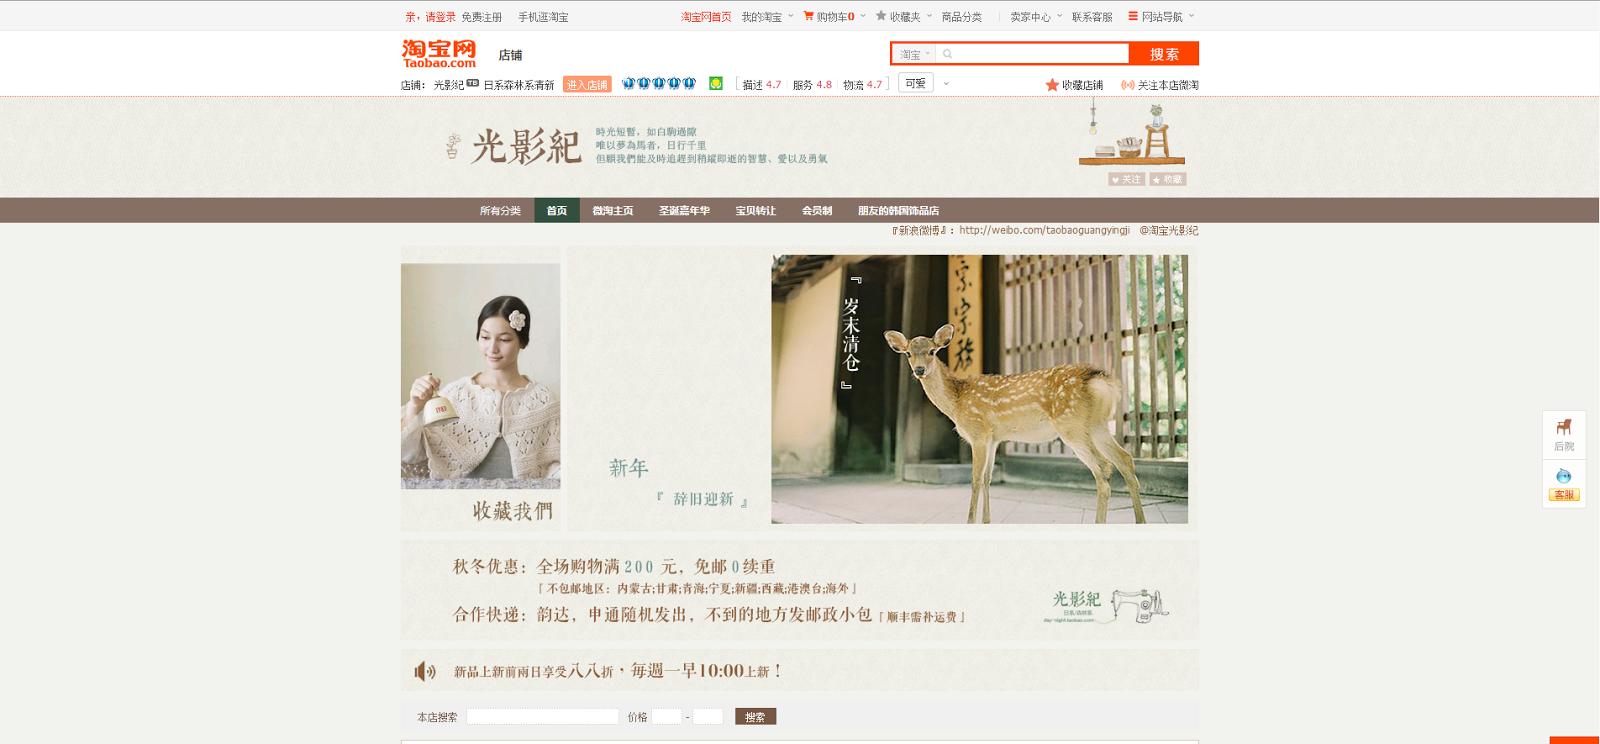 http://day-night.taobao.com